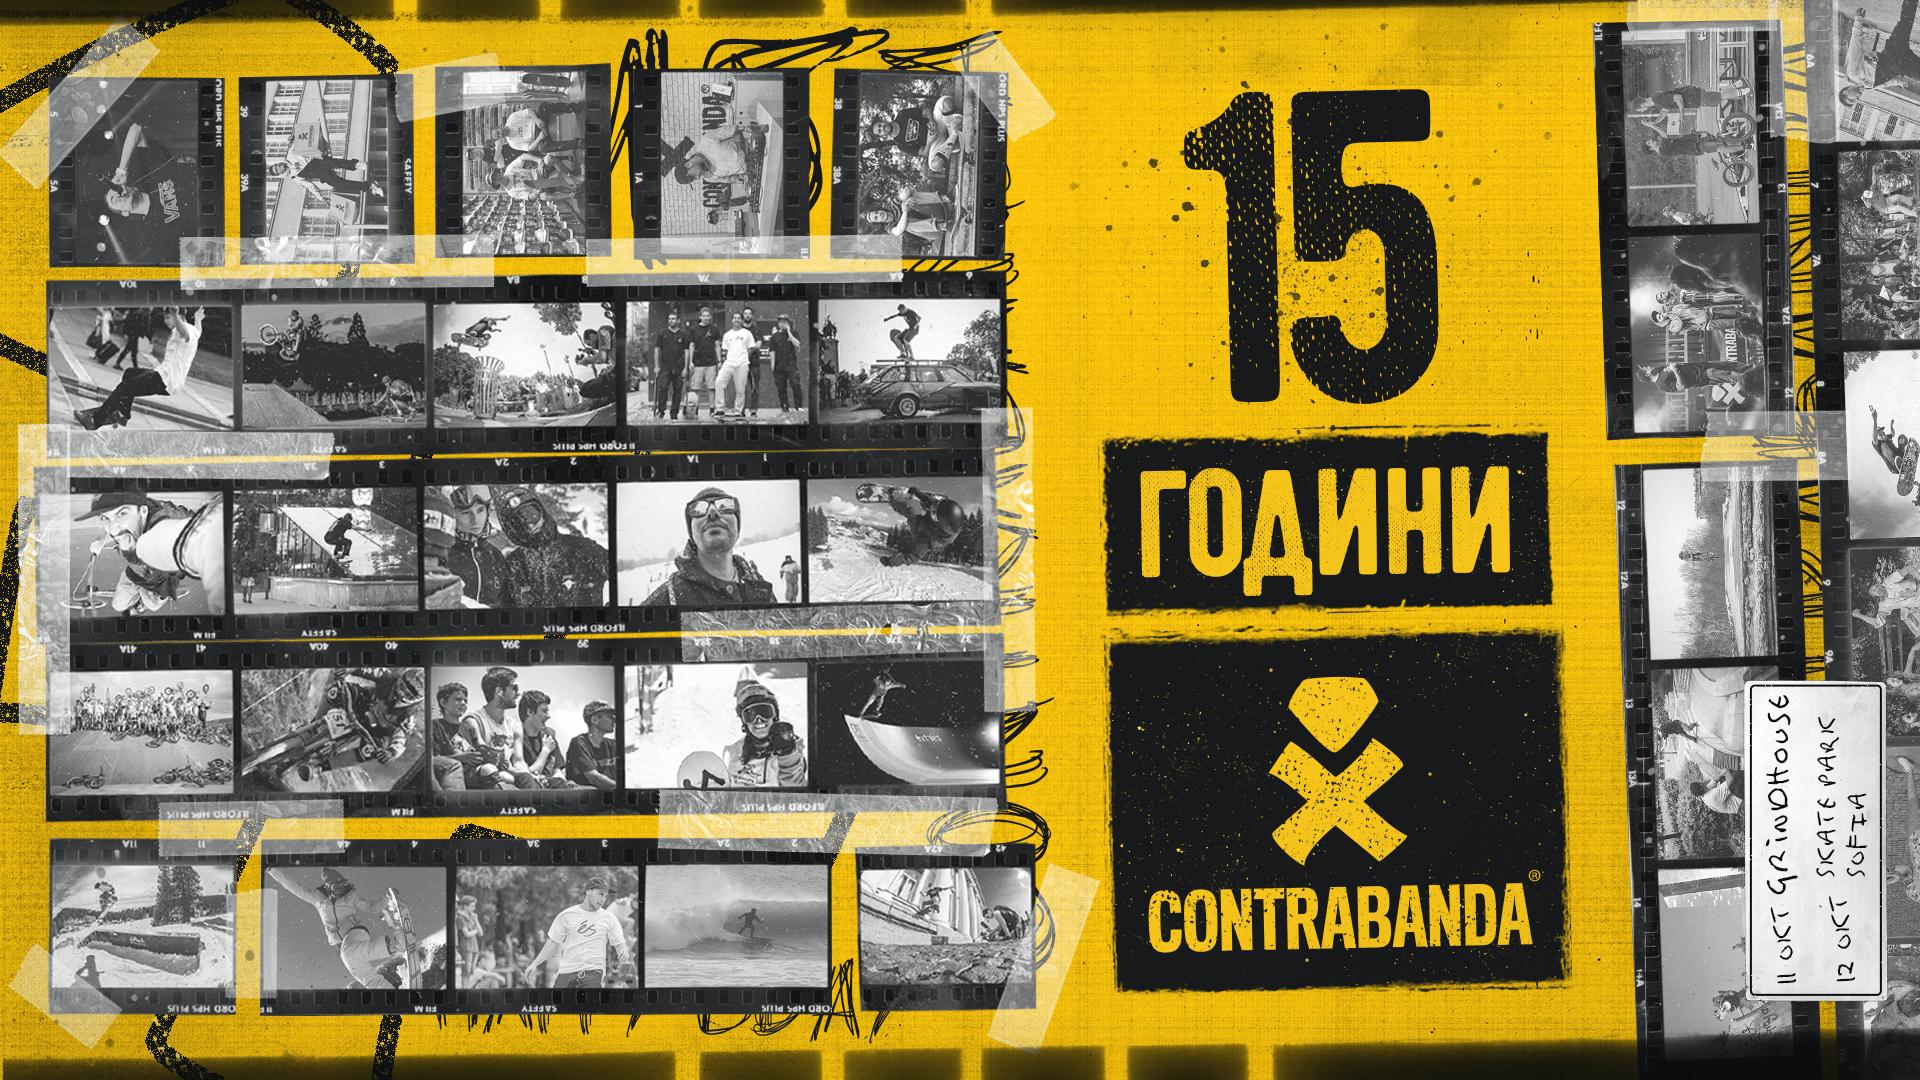 15 Години Contrabanda